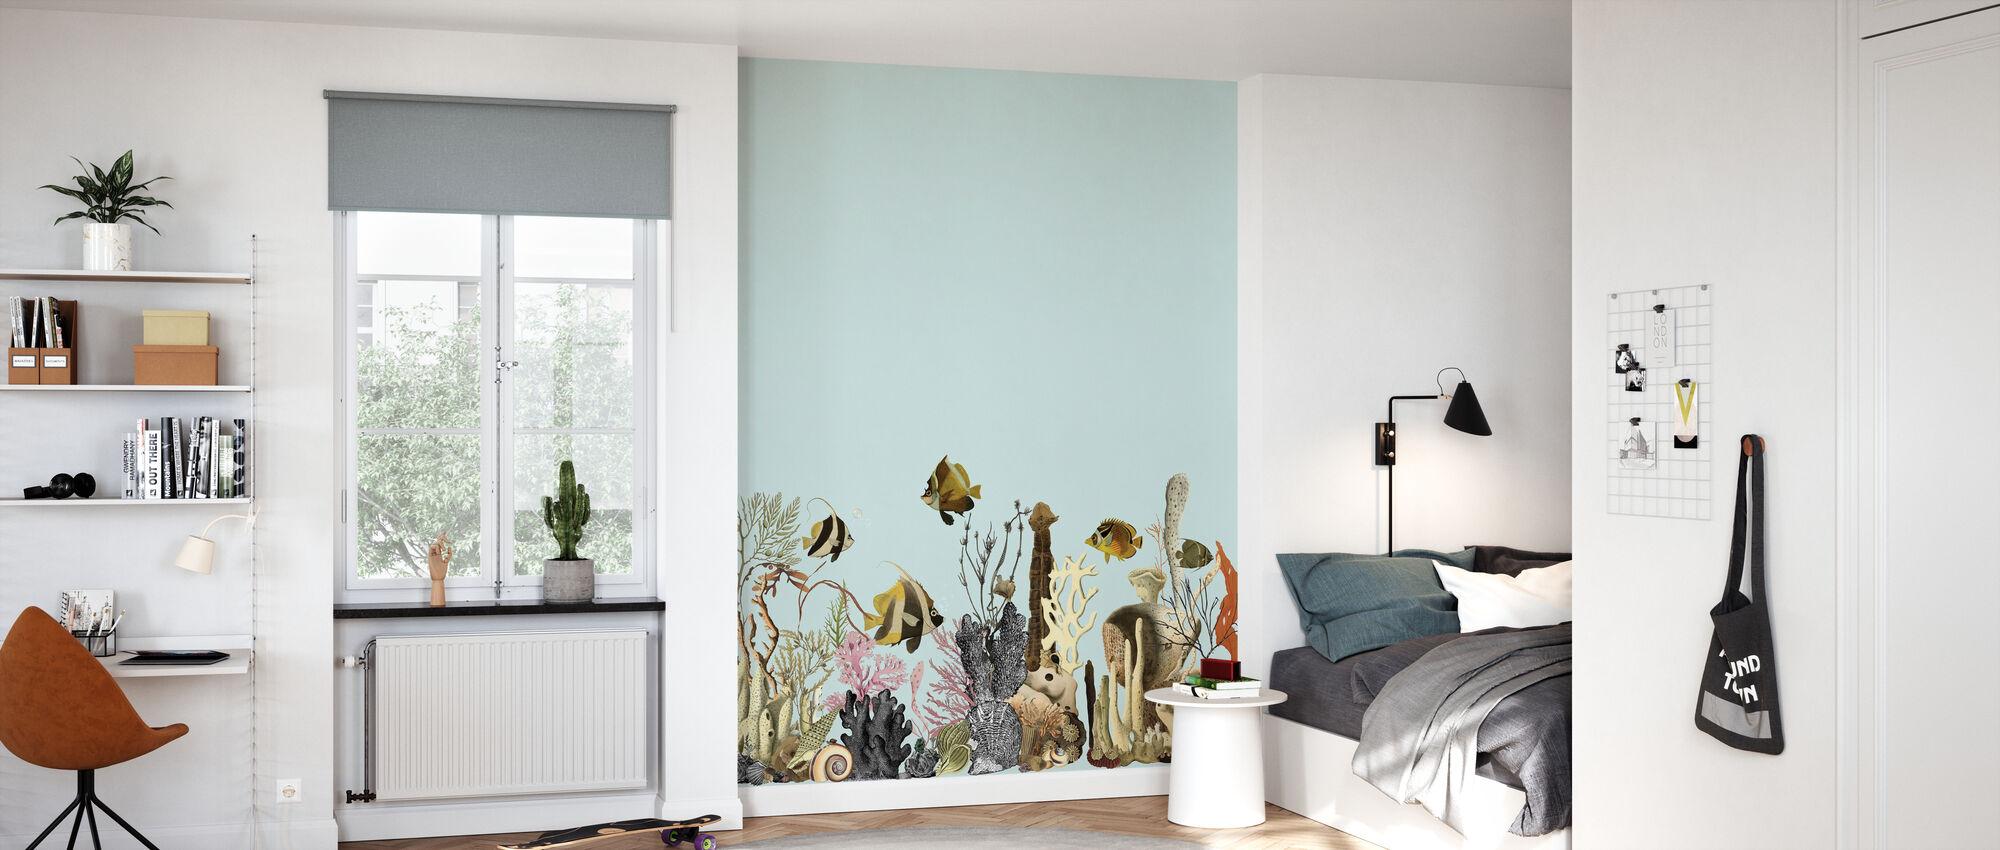 Aquarius - Green - Wallpaper - Kids Room